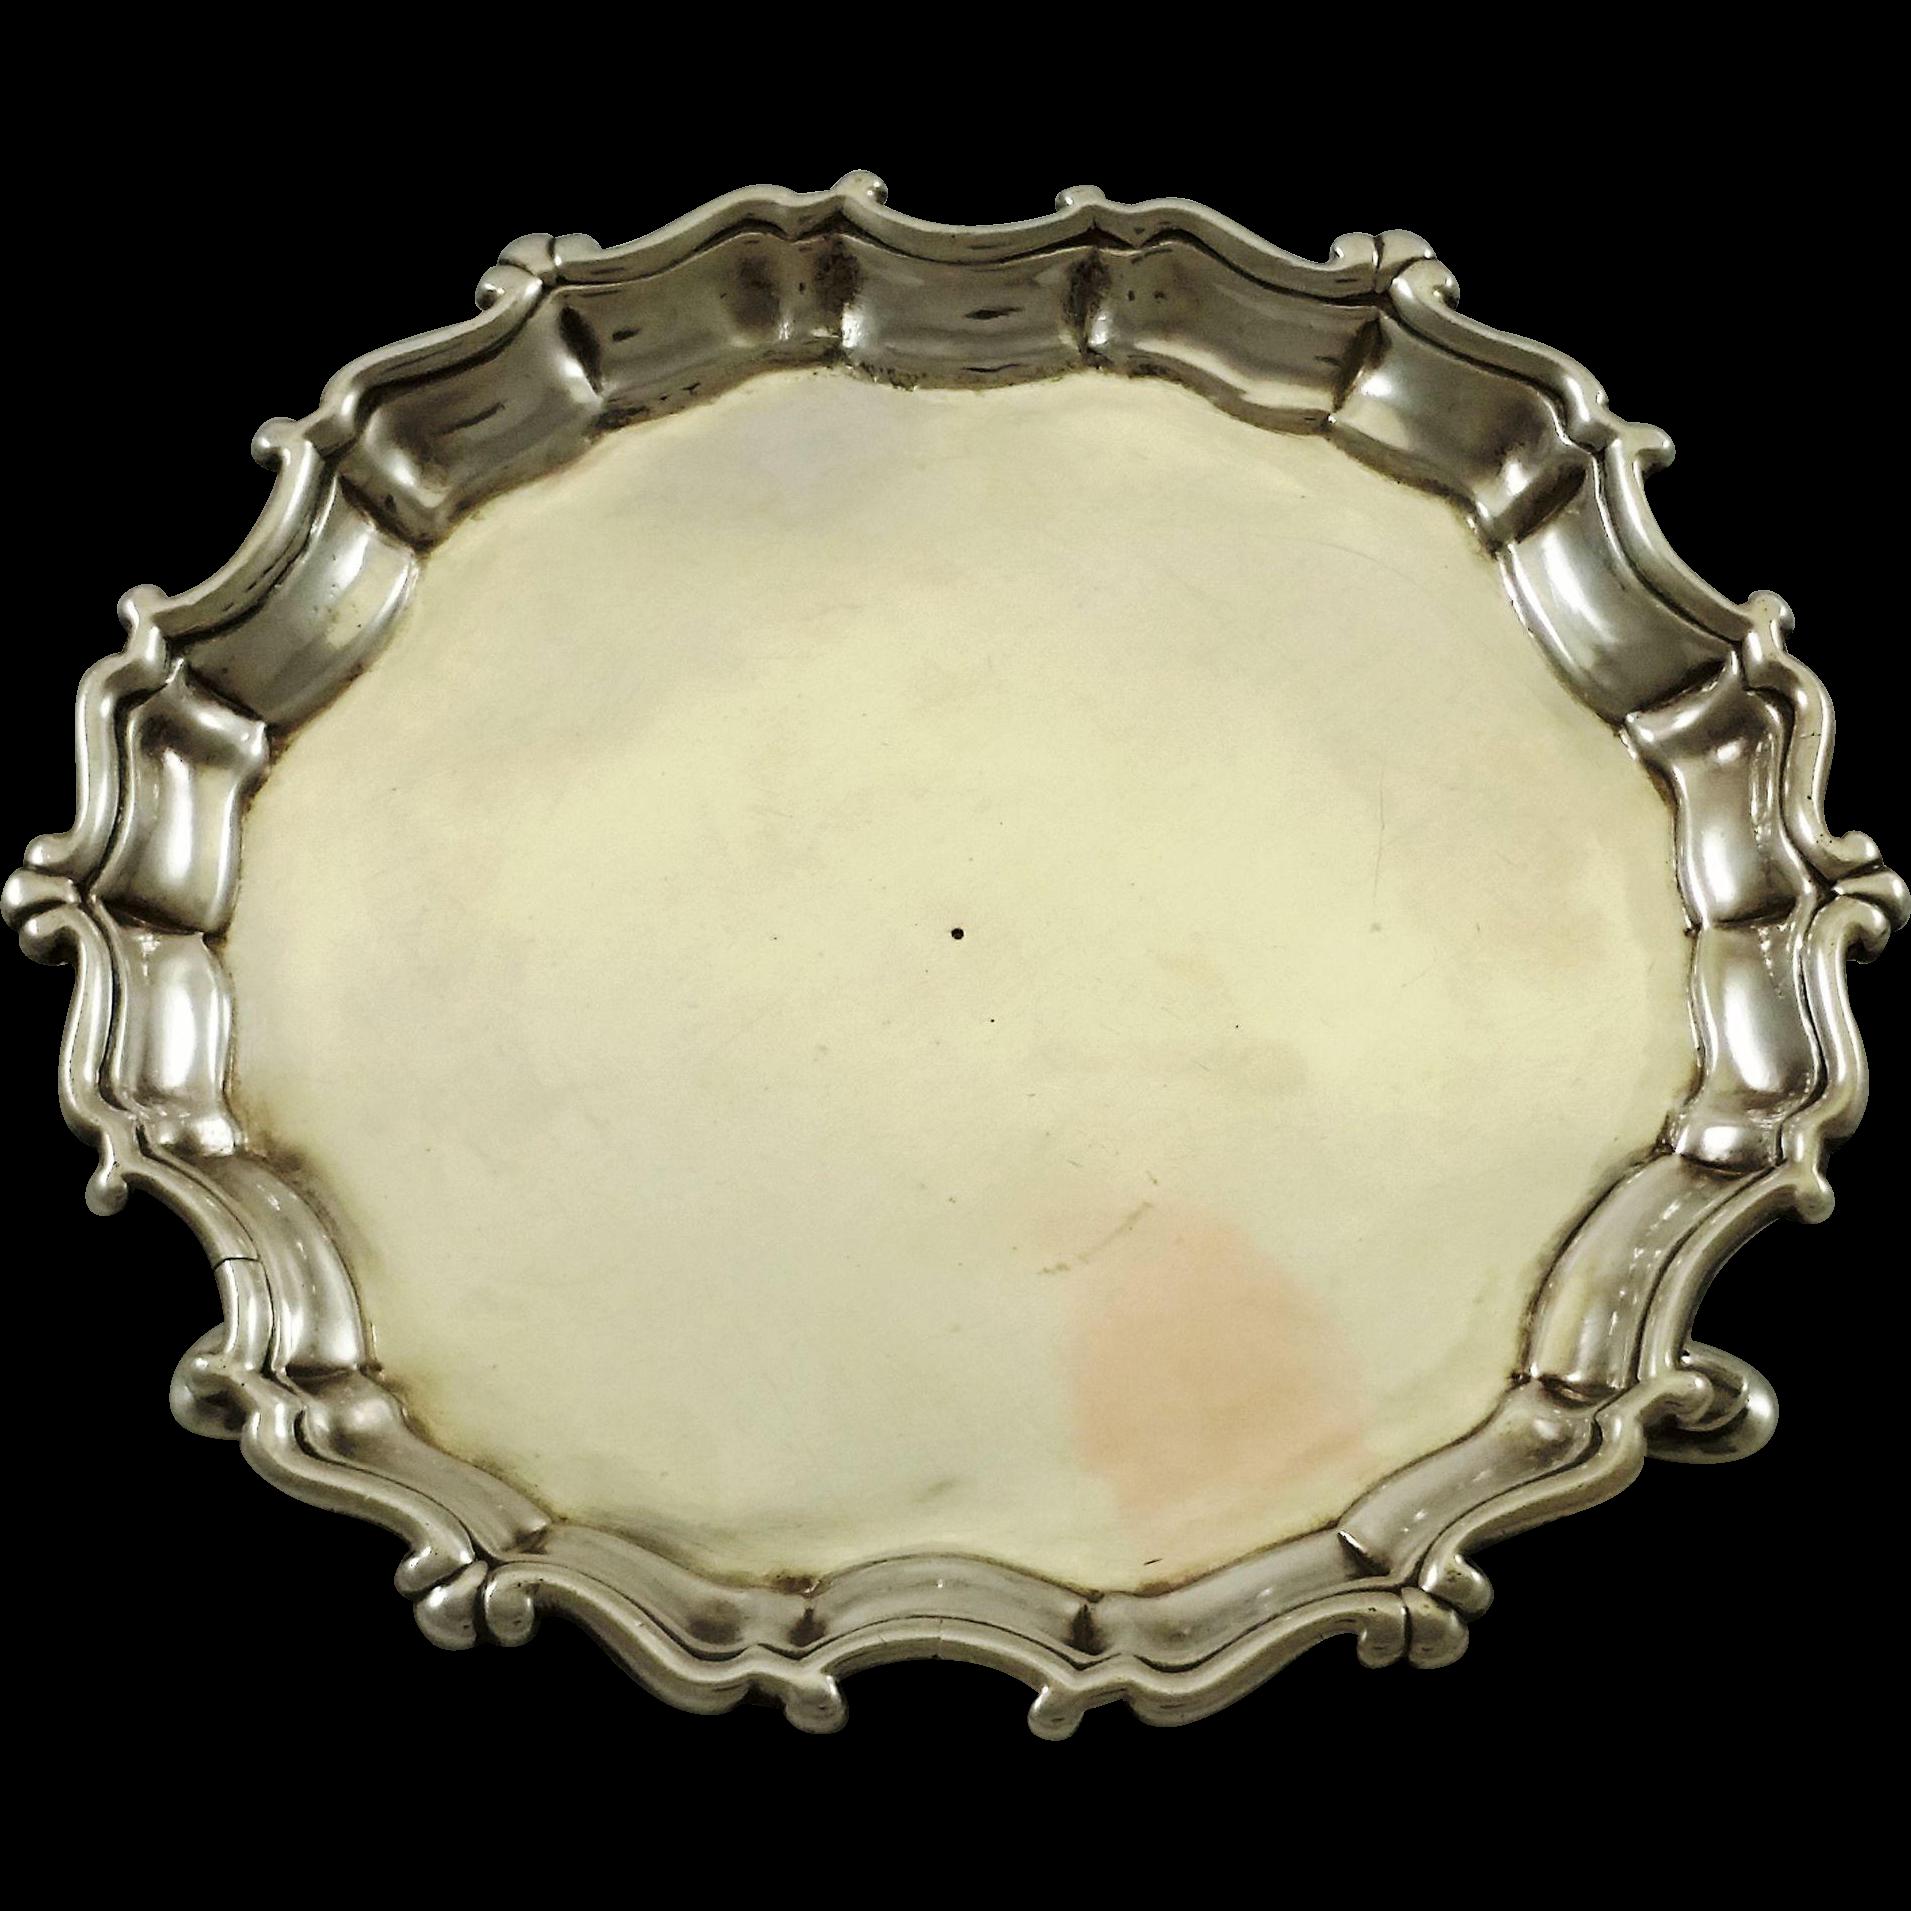 Rare Irish sterling silver salver by B. Mosse c. 1750